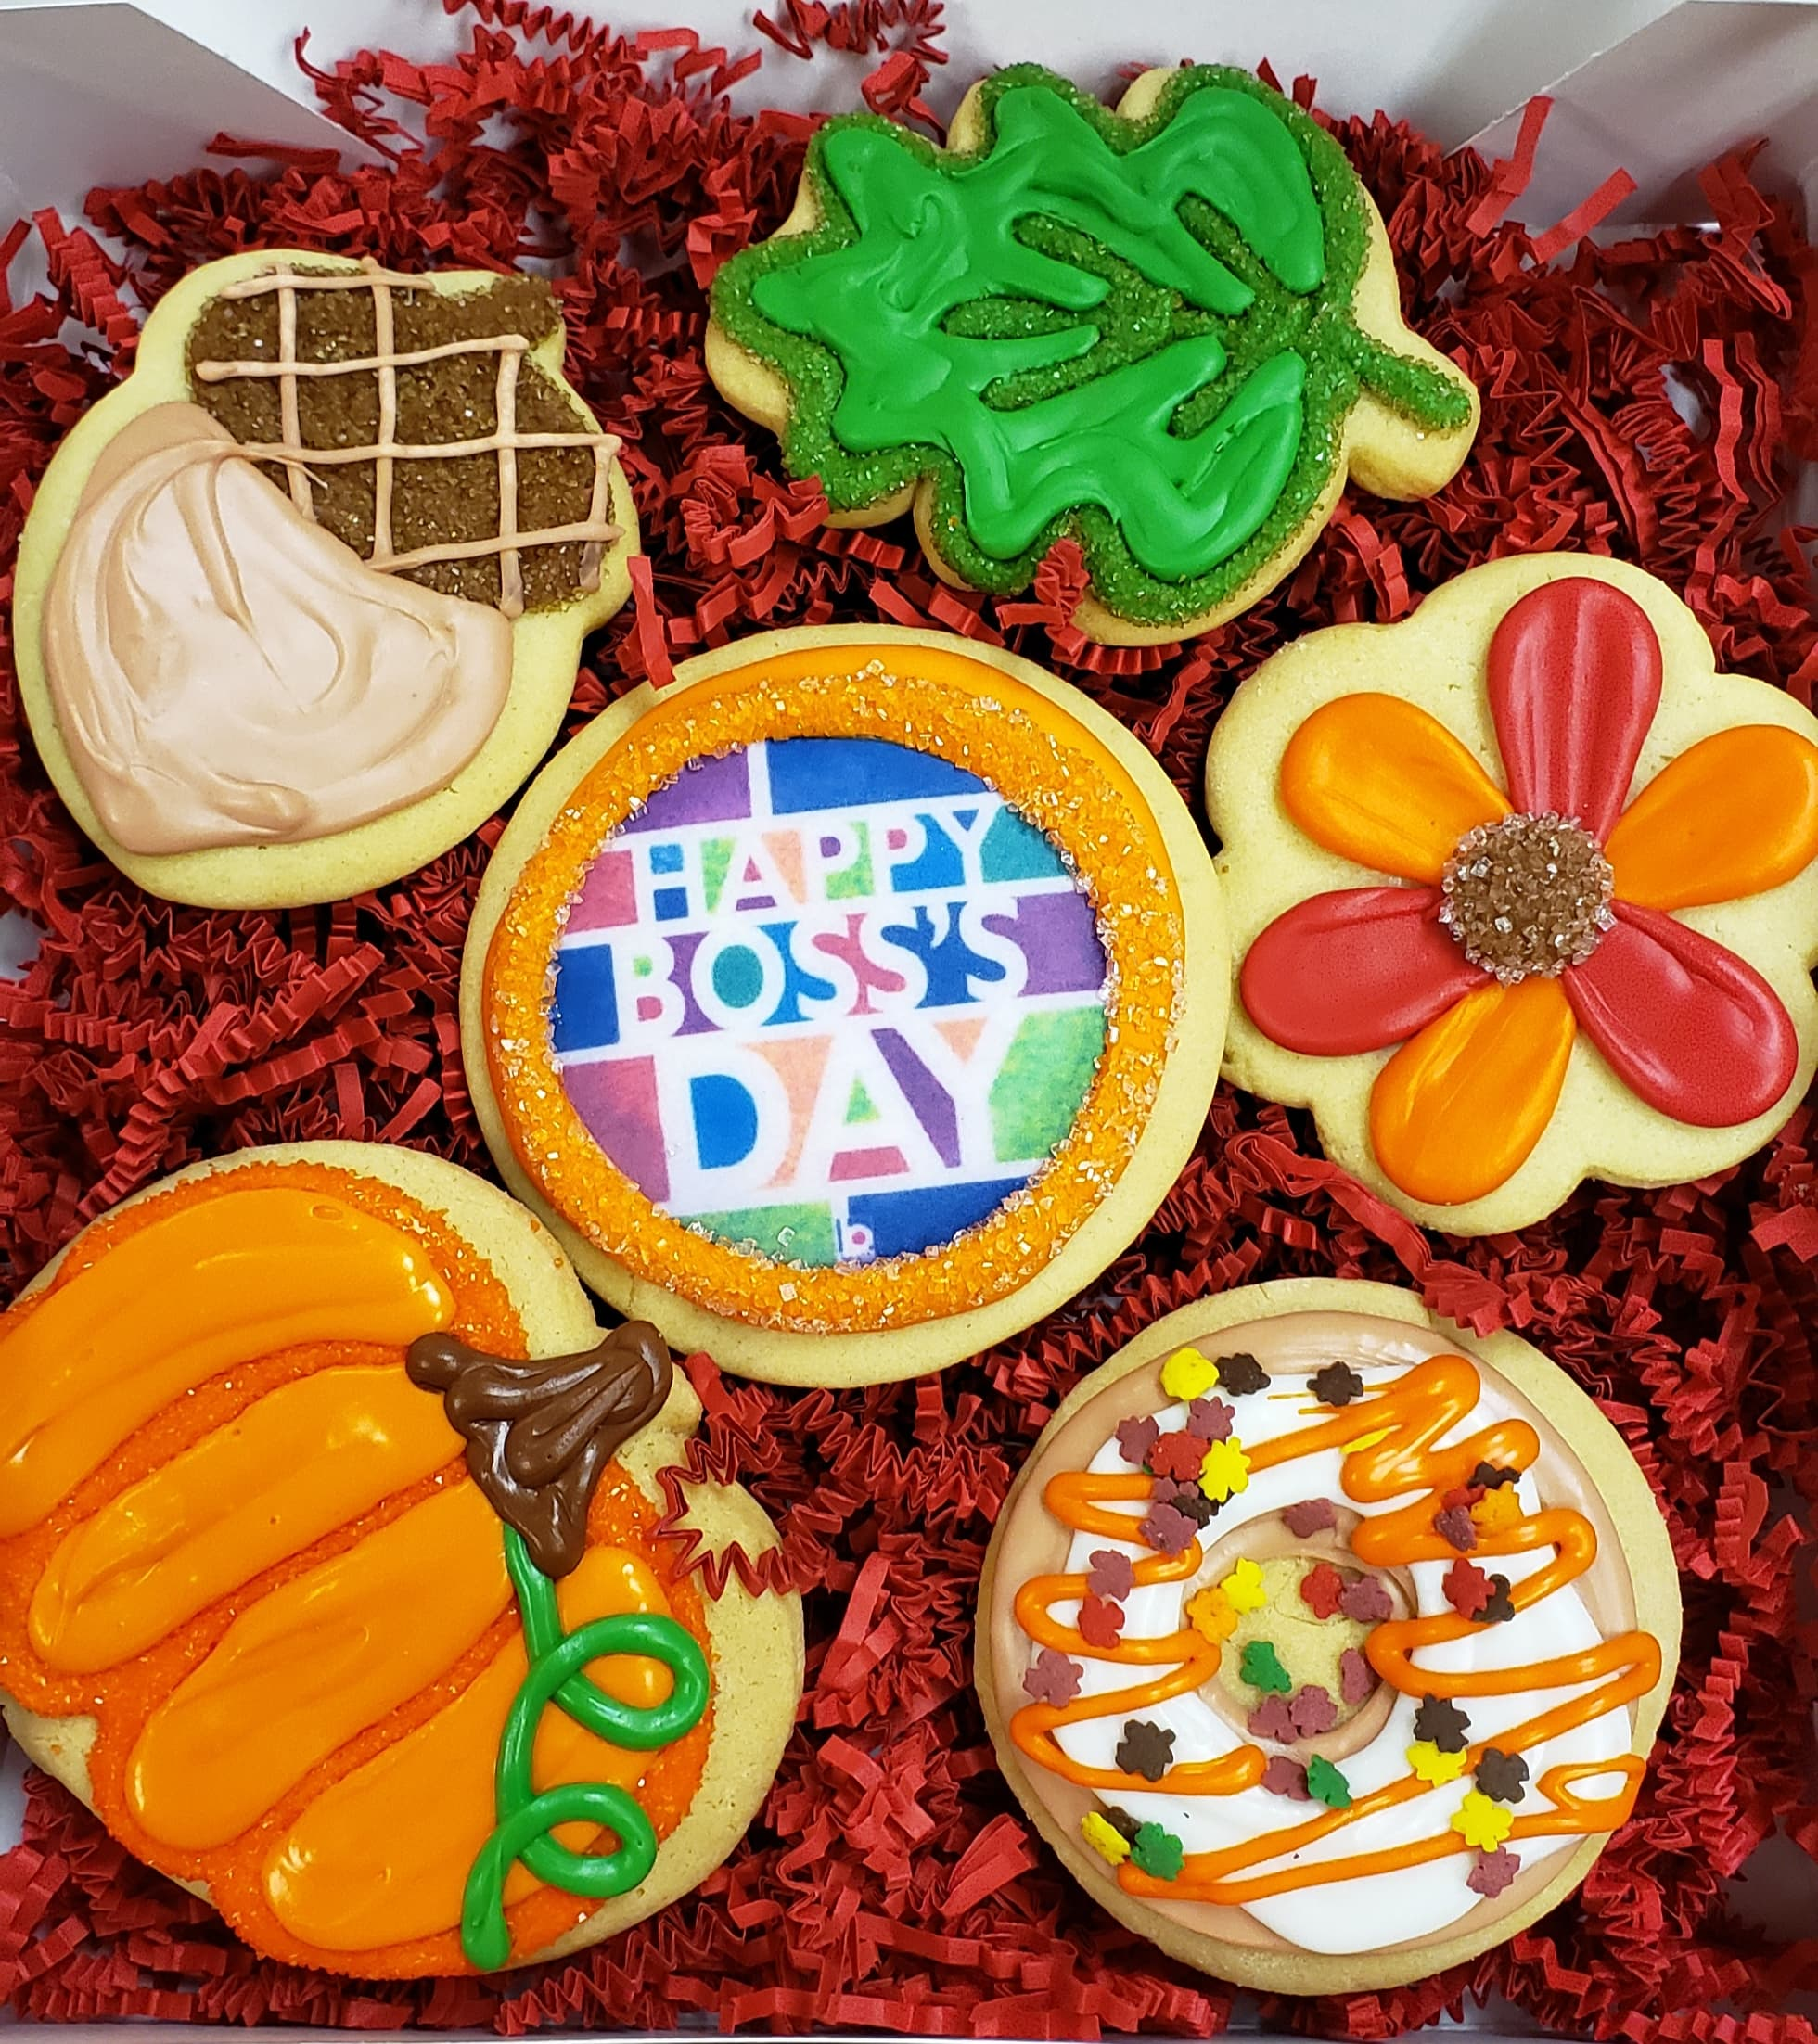 6 Boss's Day Cookie Assortment